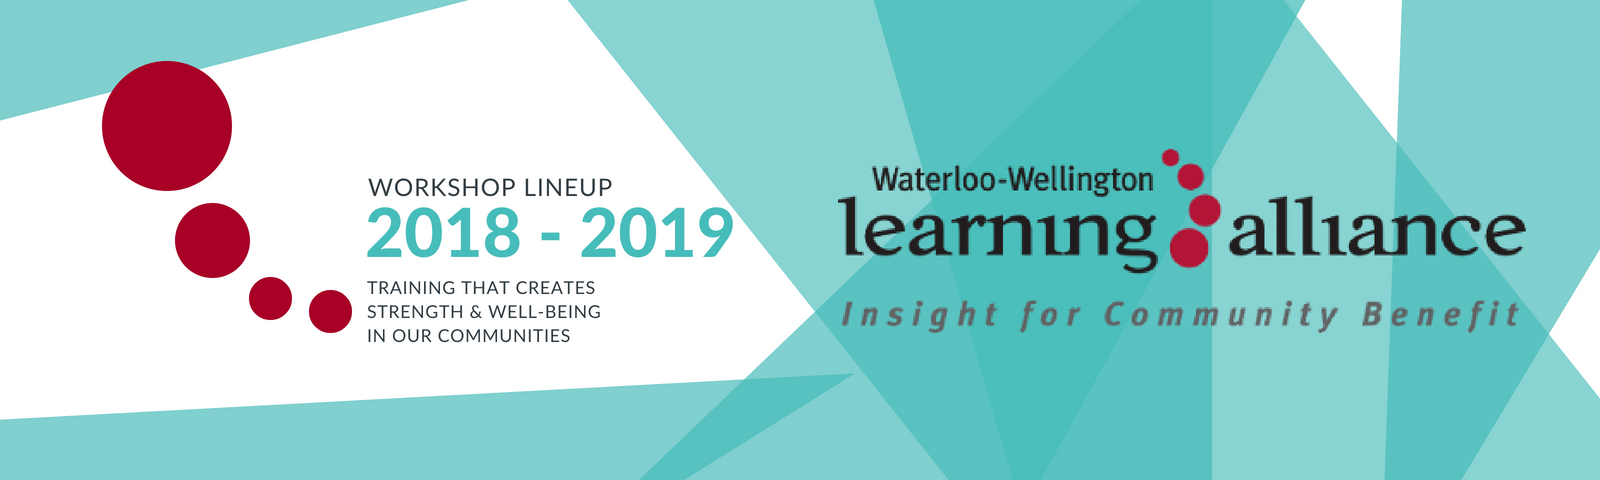 waterloo-wellington learning alliance community lineup 2018-2019